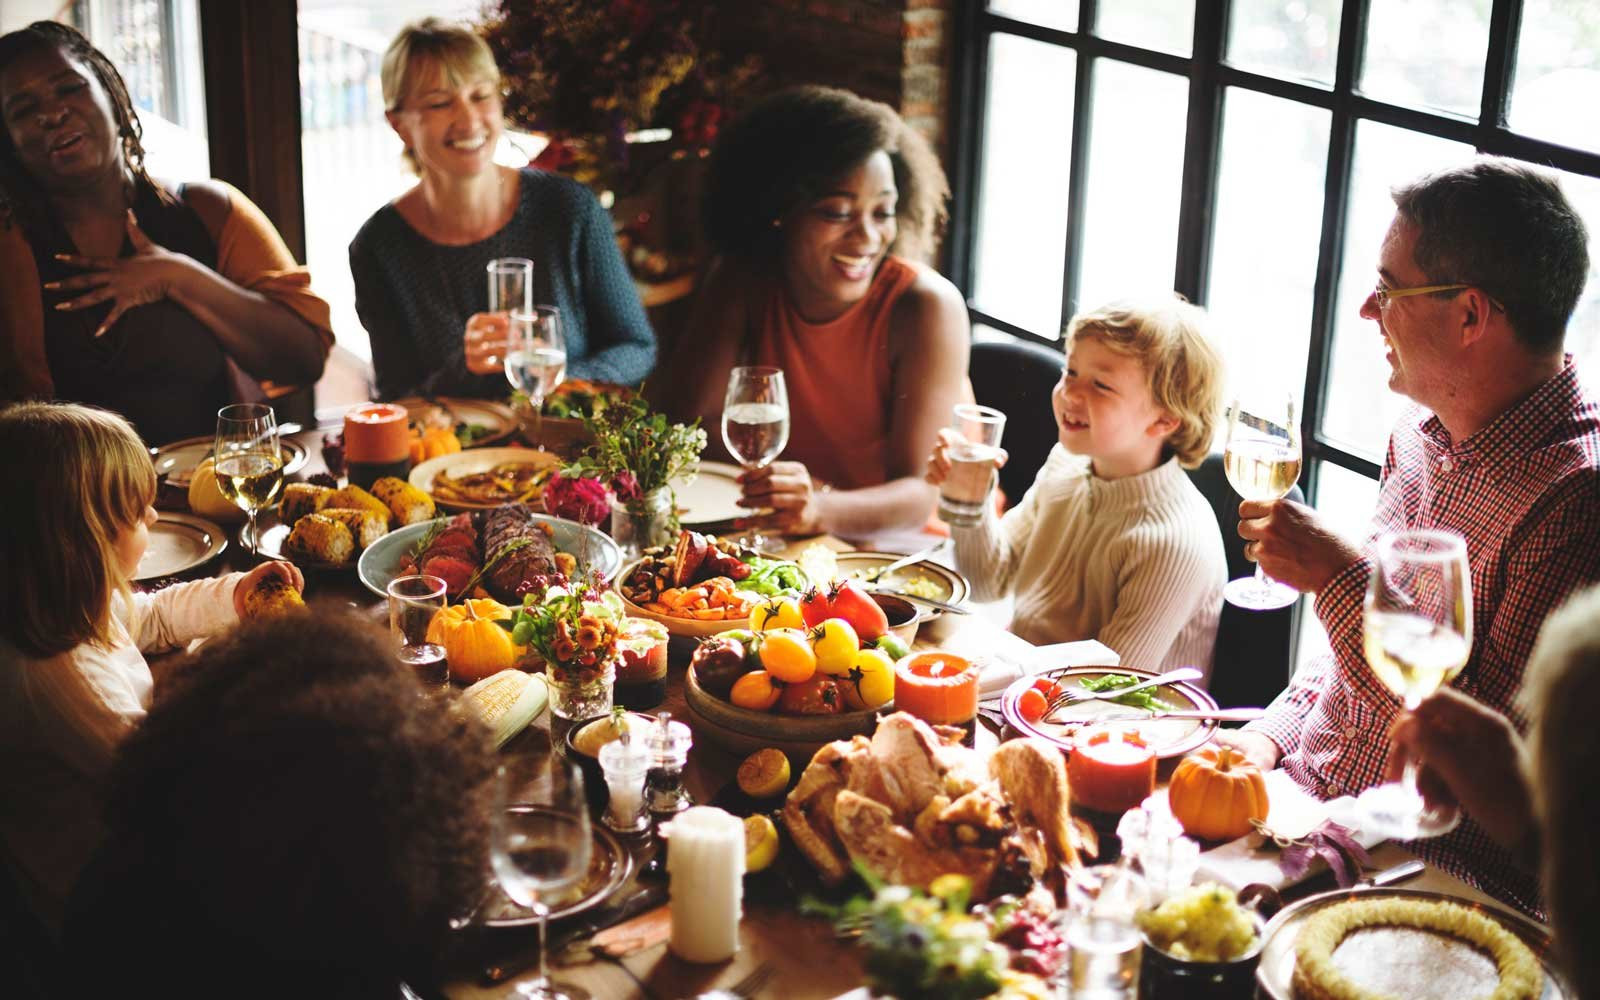 Family Thanksgiving Dinner  5 Pro Tips For Not Ruining Thanksgiving Dinner With